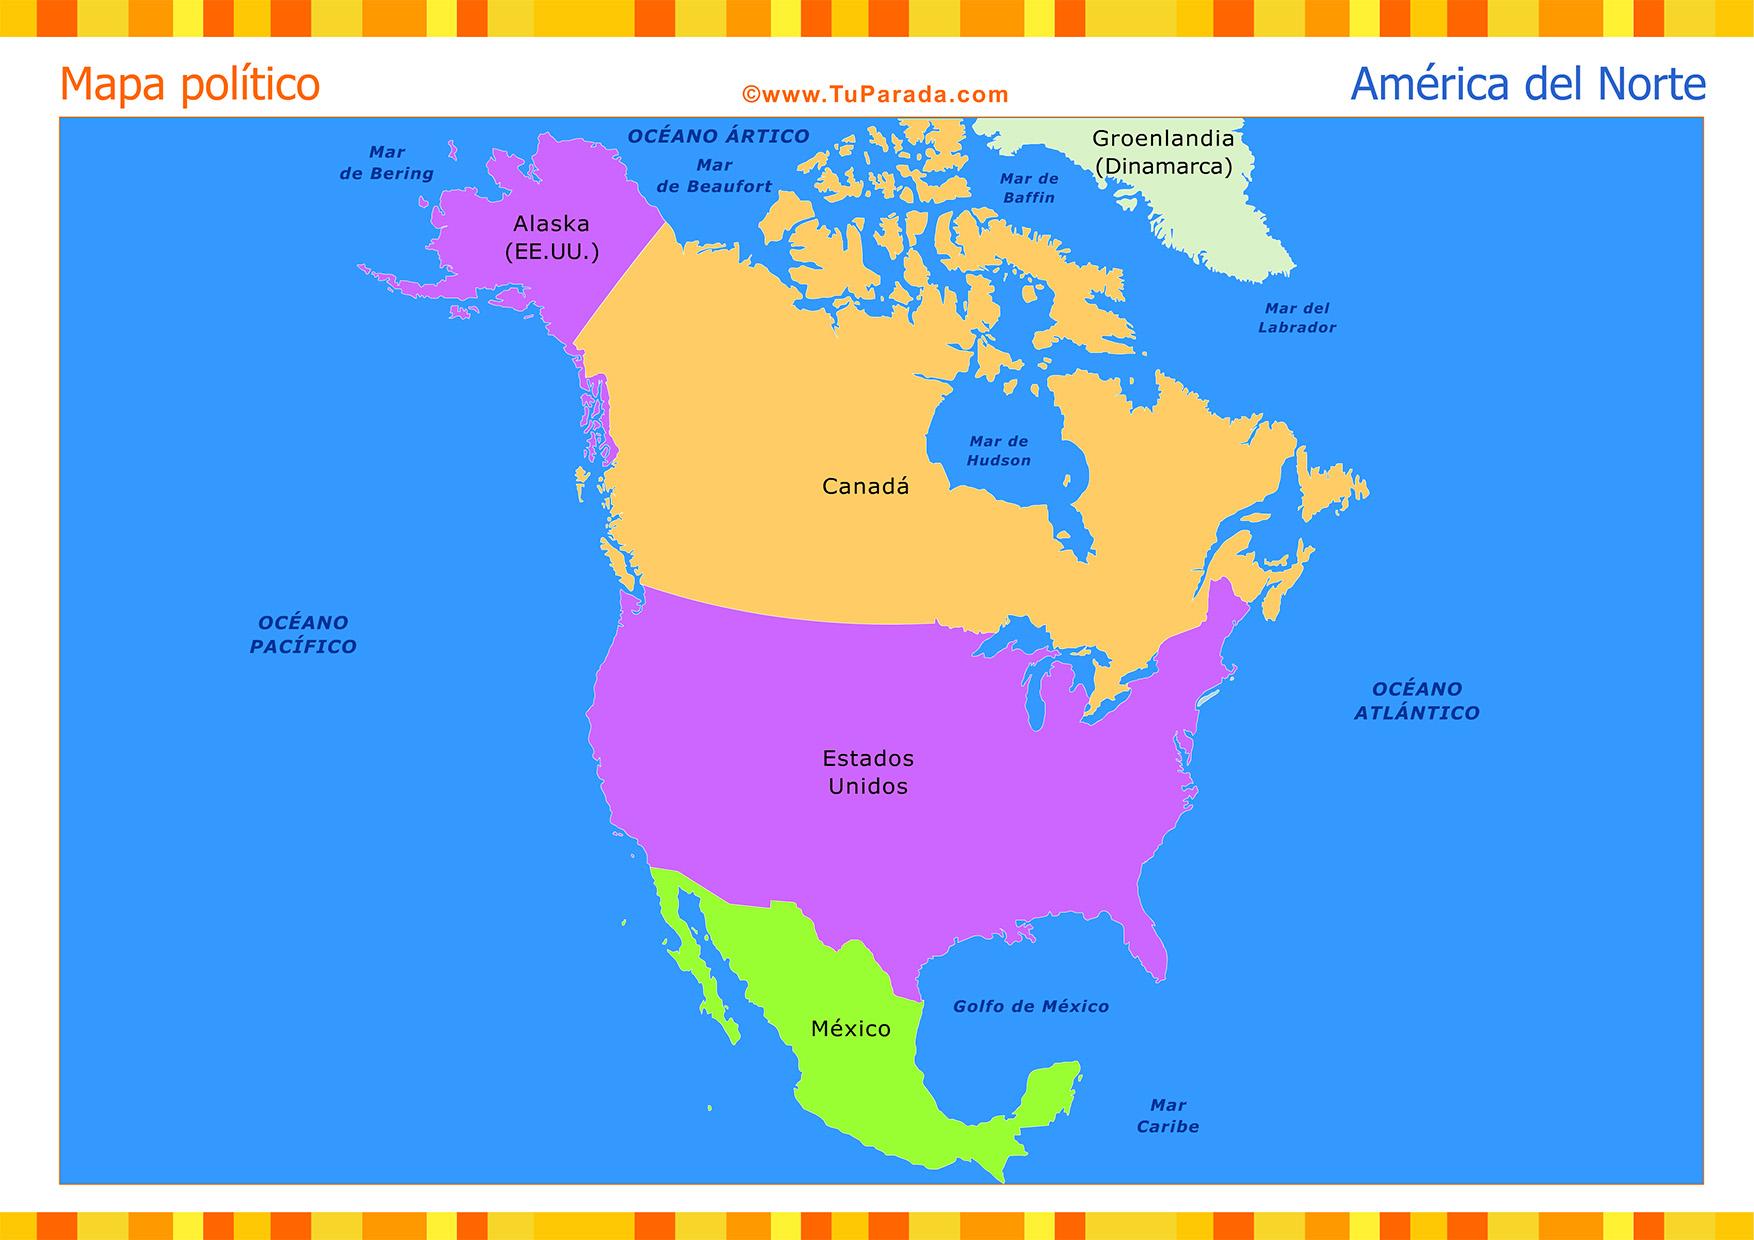 Mapa de Amrica del Norte poltico Mapas tarjetas